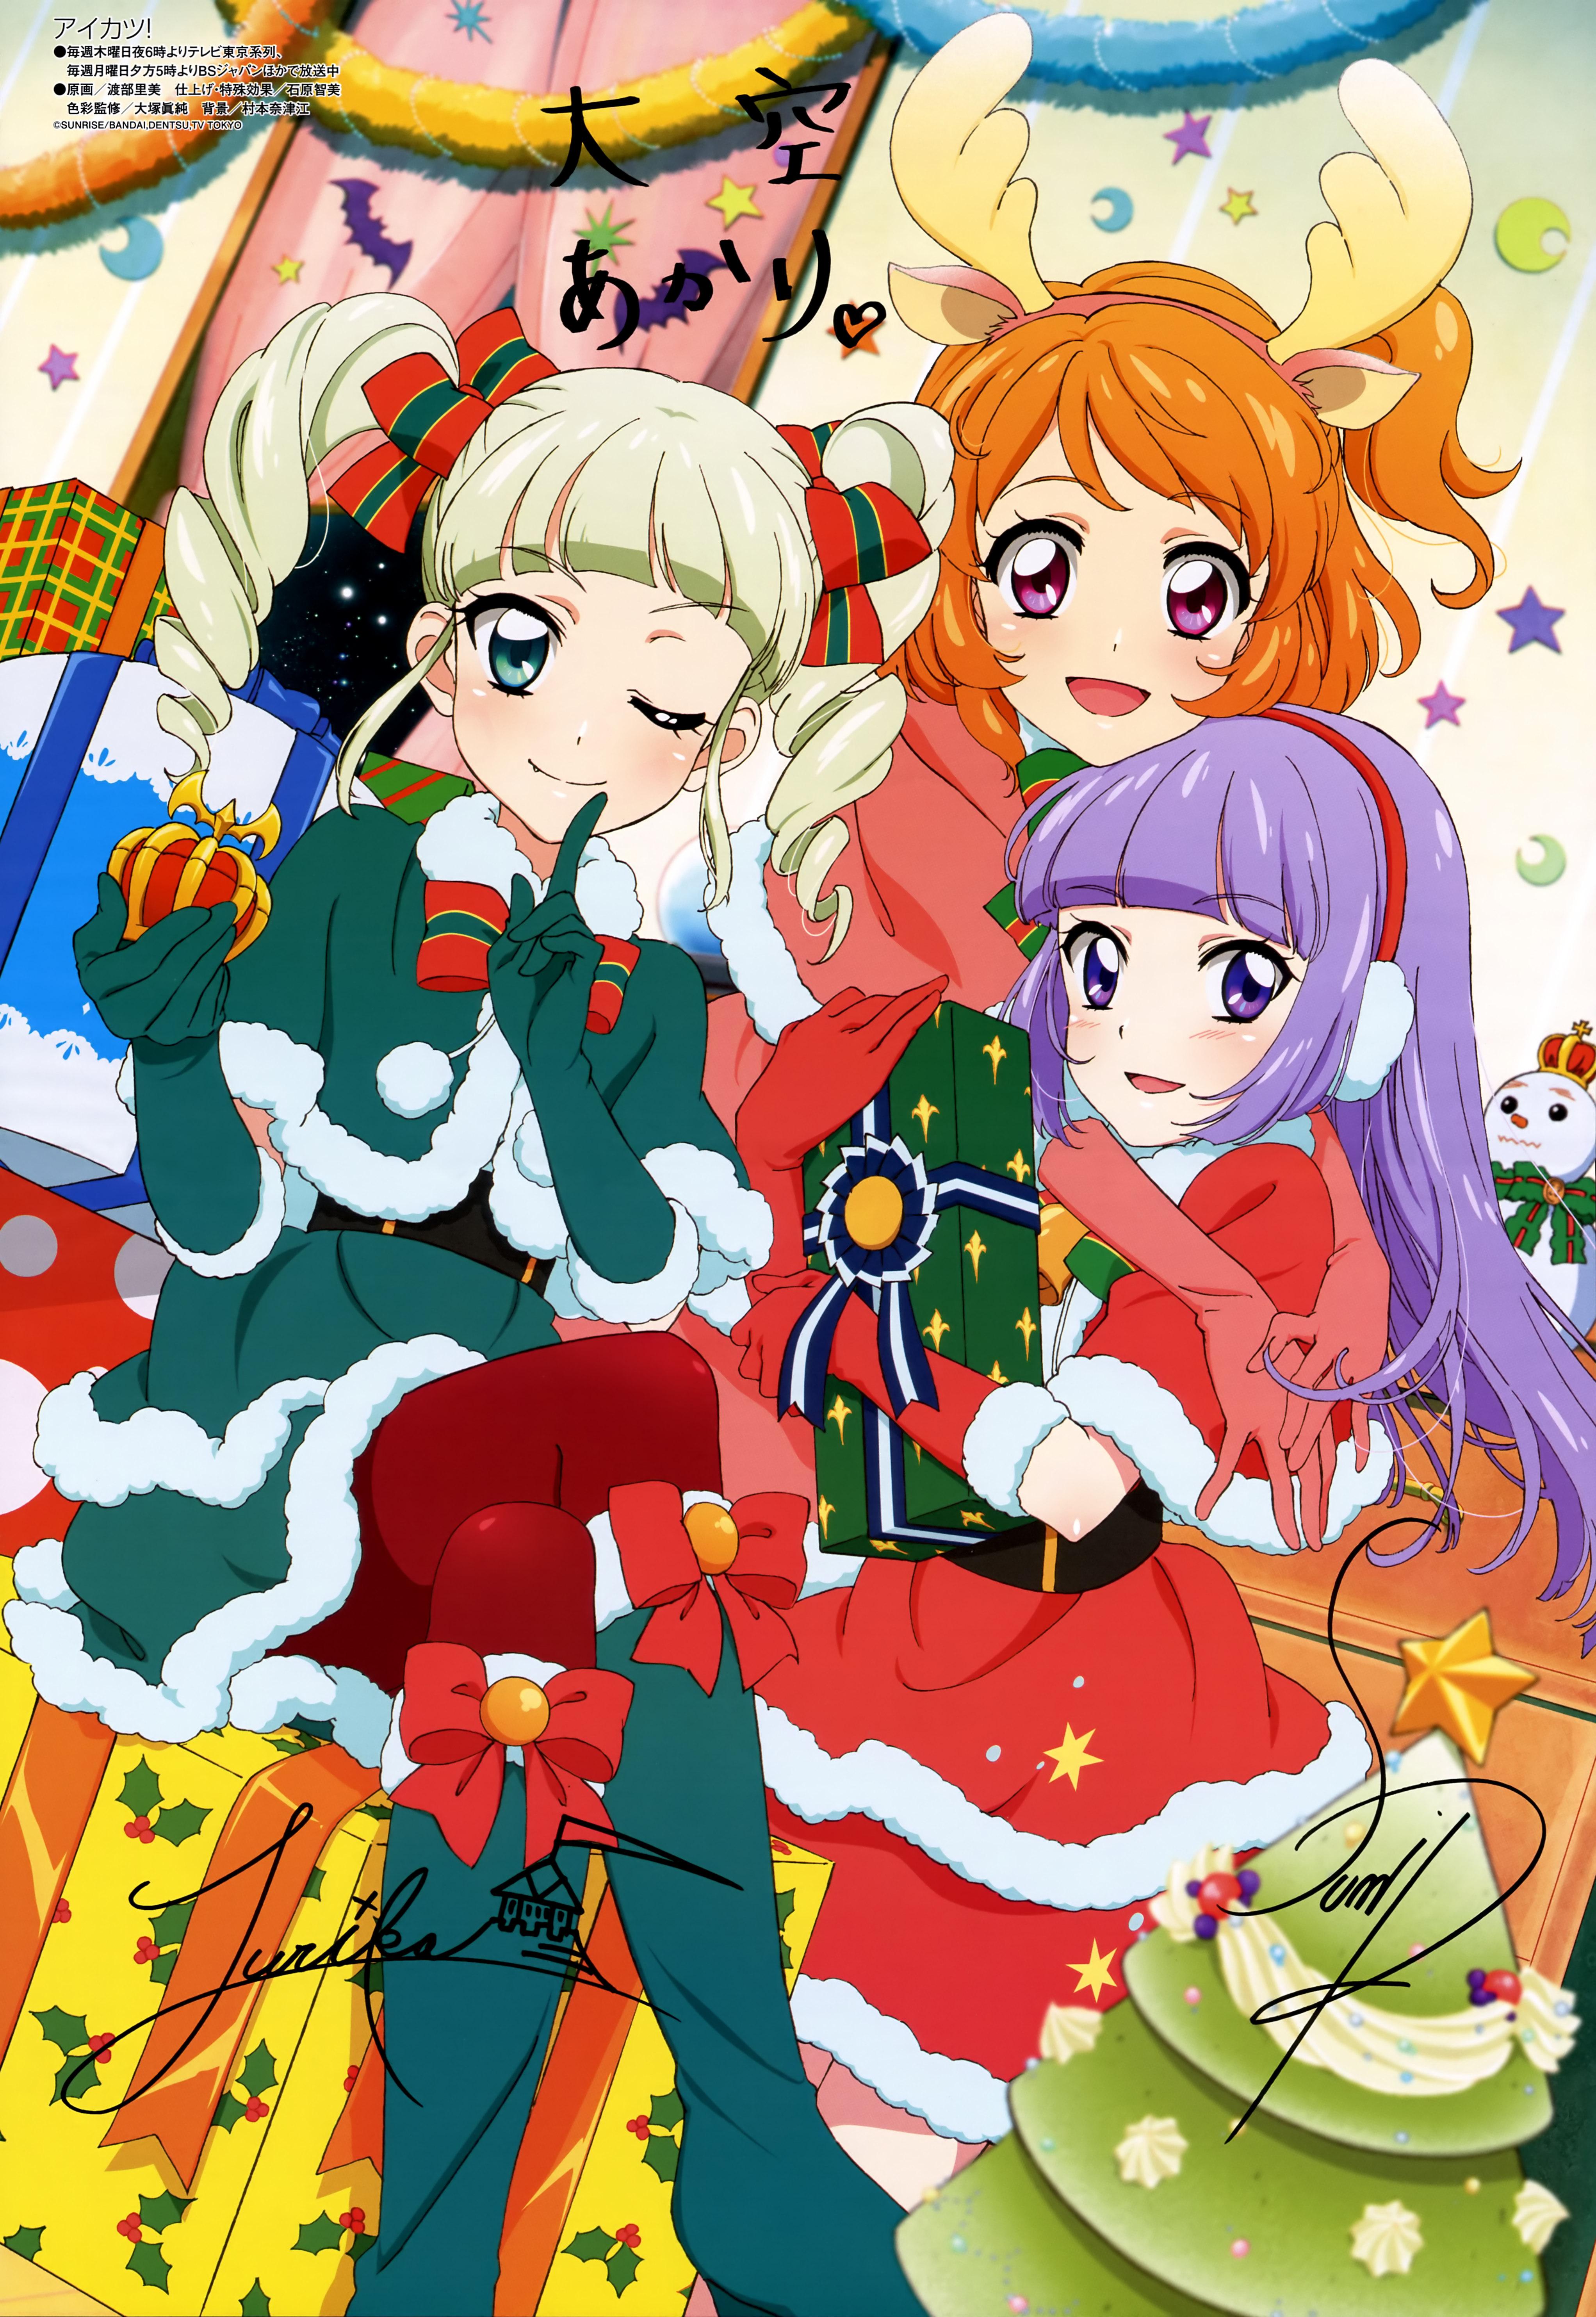 Aikatsu Mobile Wallpaper 1796914 Zerochan Anime Image Board